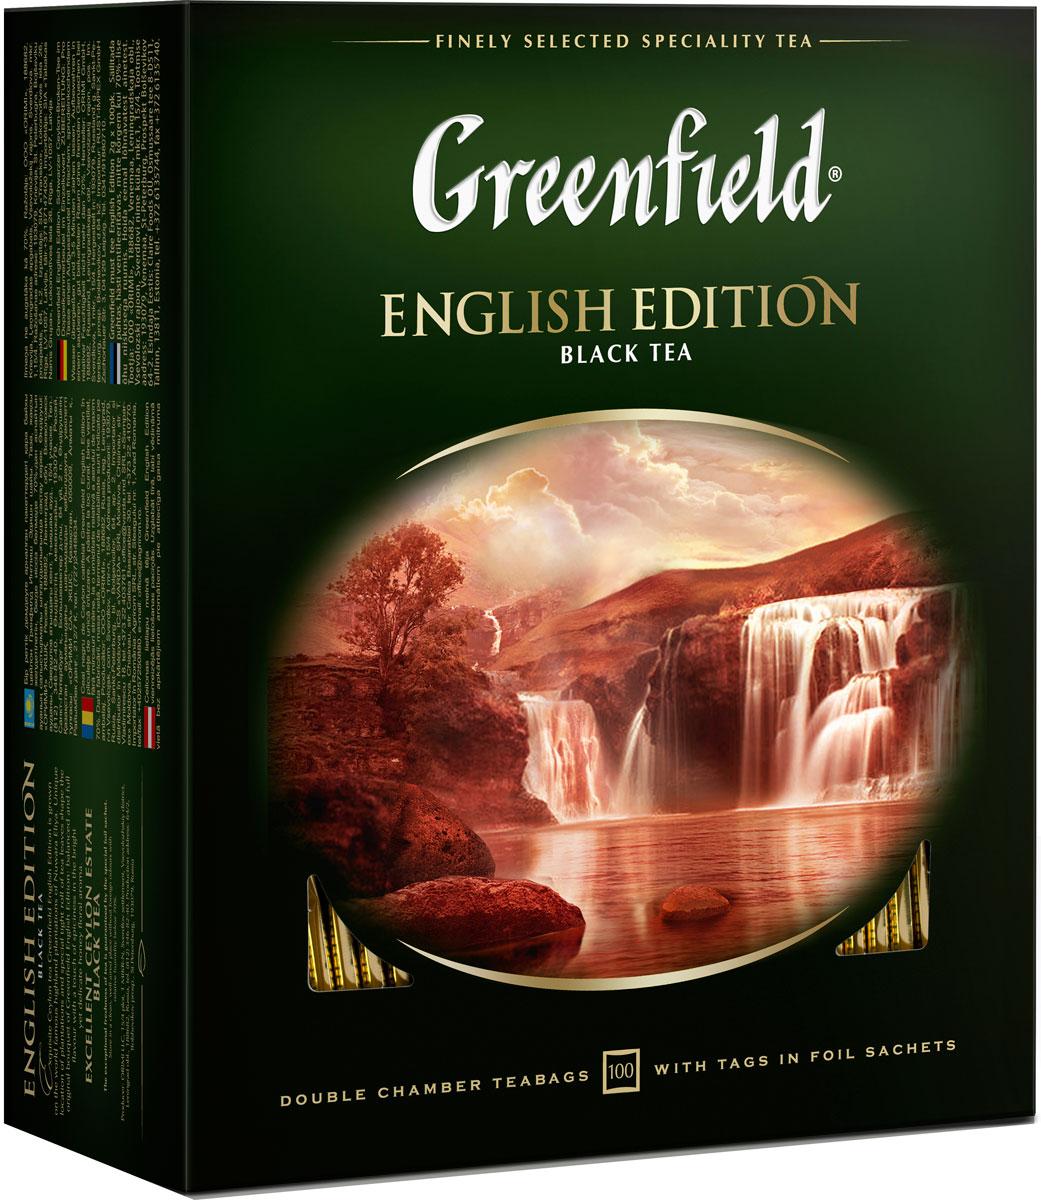 Greenfield English Edition черный чай в пакетиках, 100 шт john greenfield power from on high